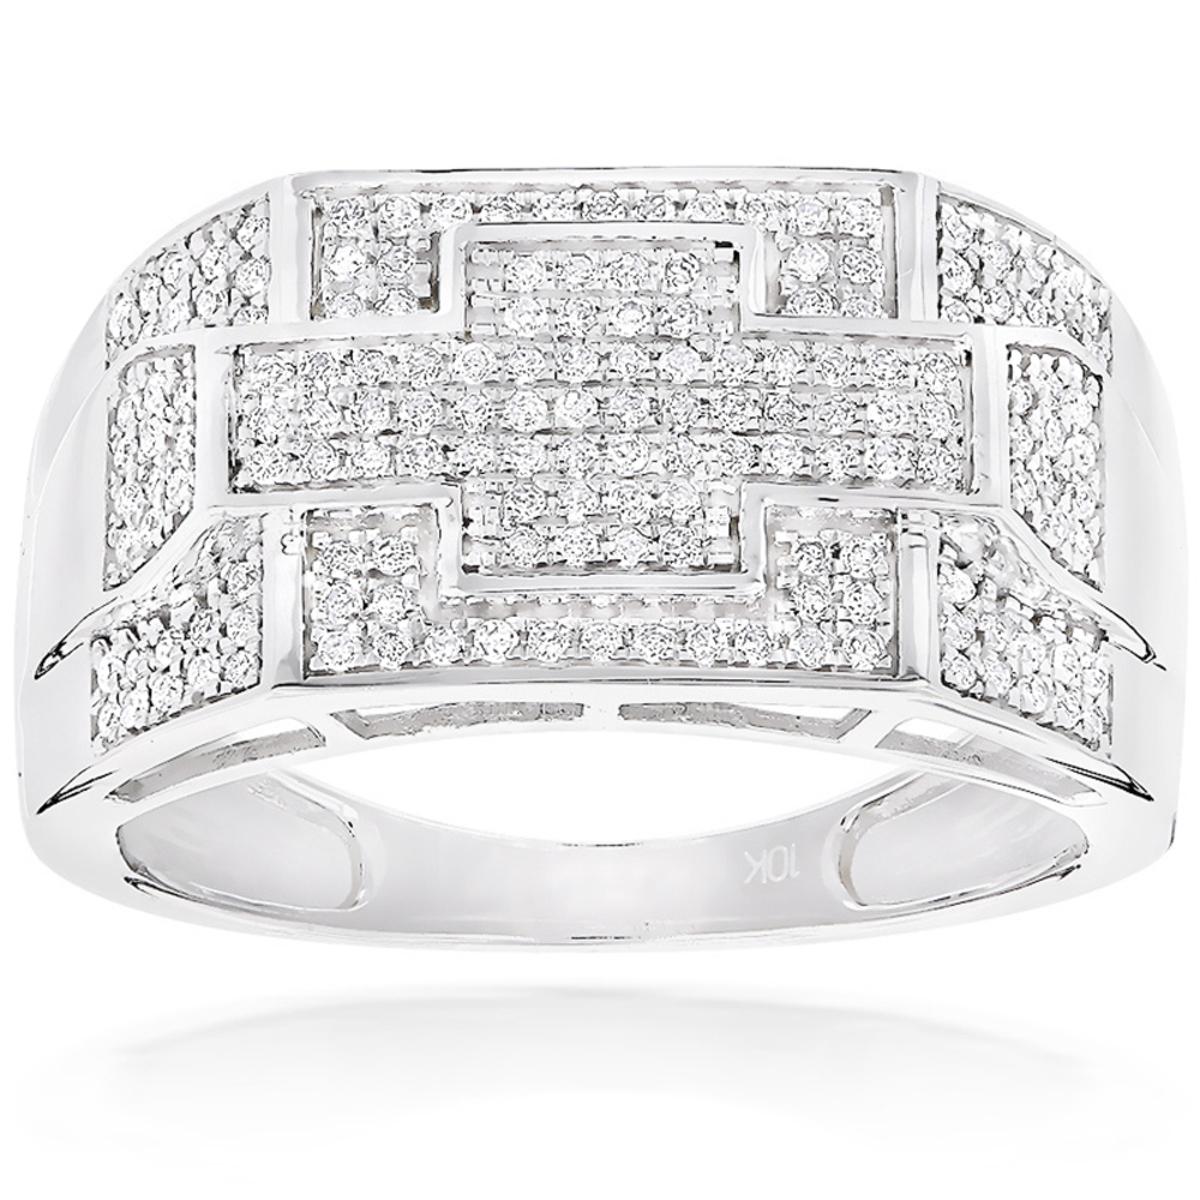 Gold Diamond Mens Ring 0.5ct 10K Pinky Ring